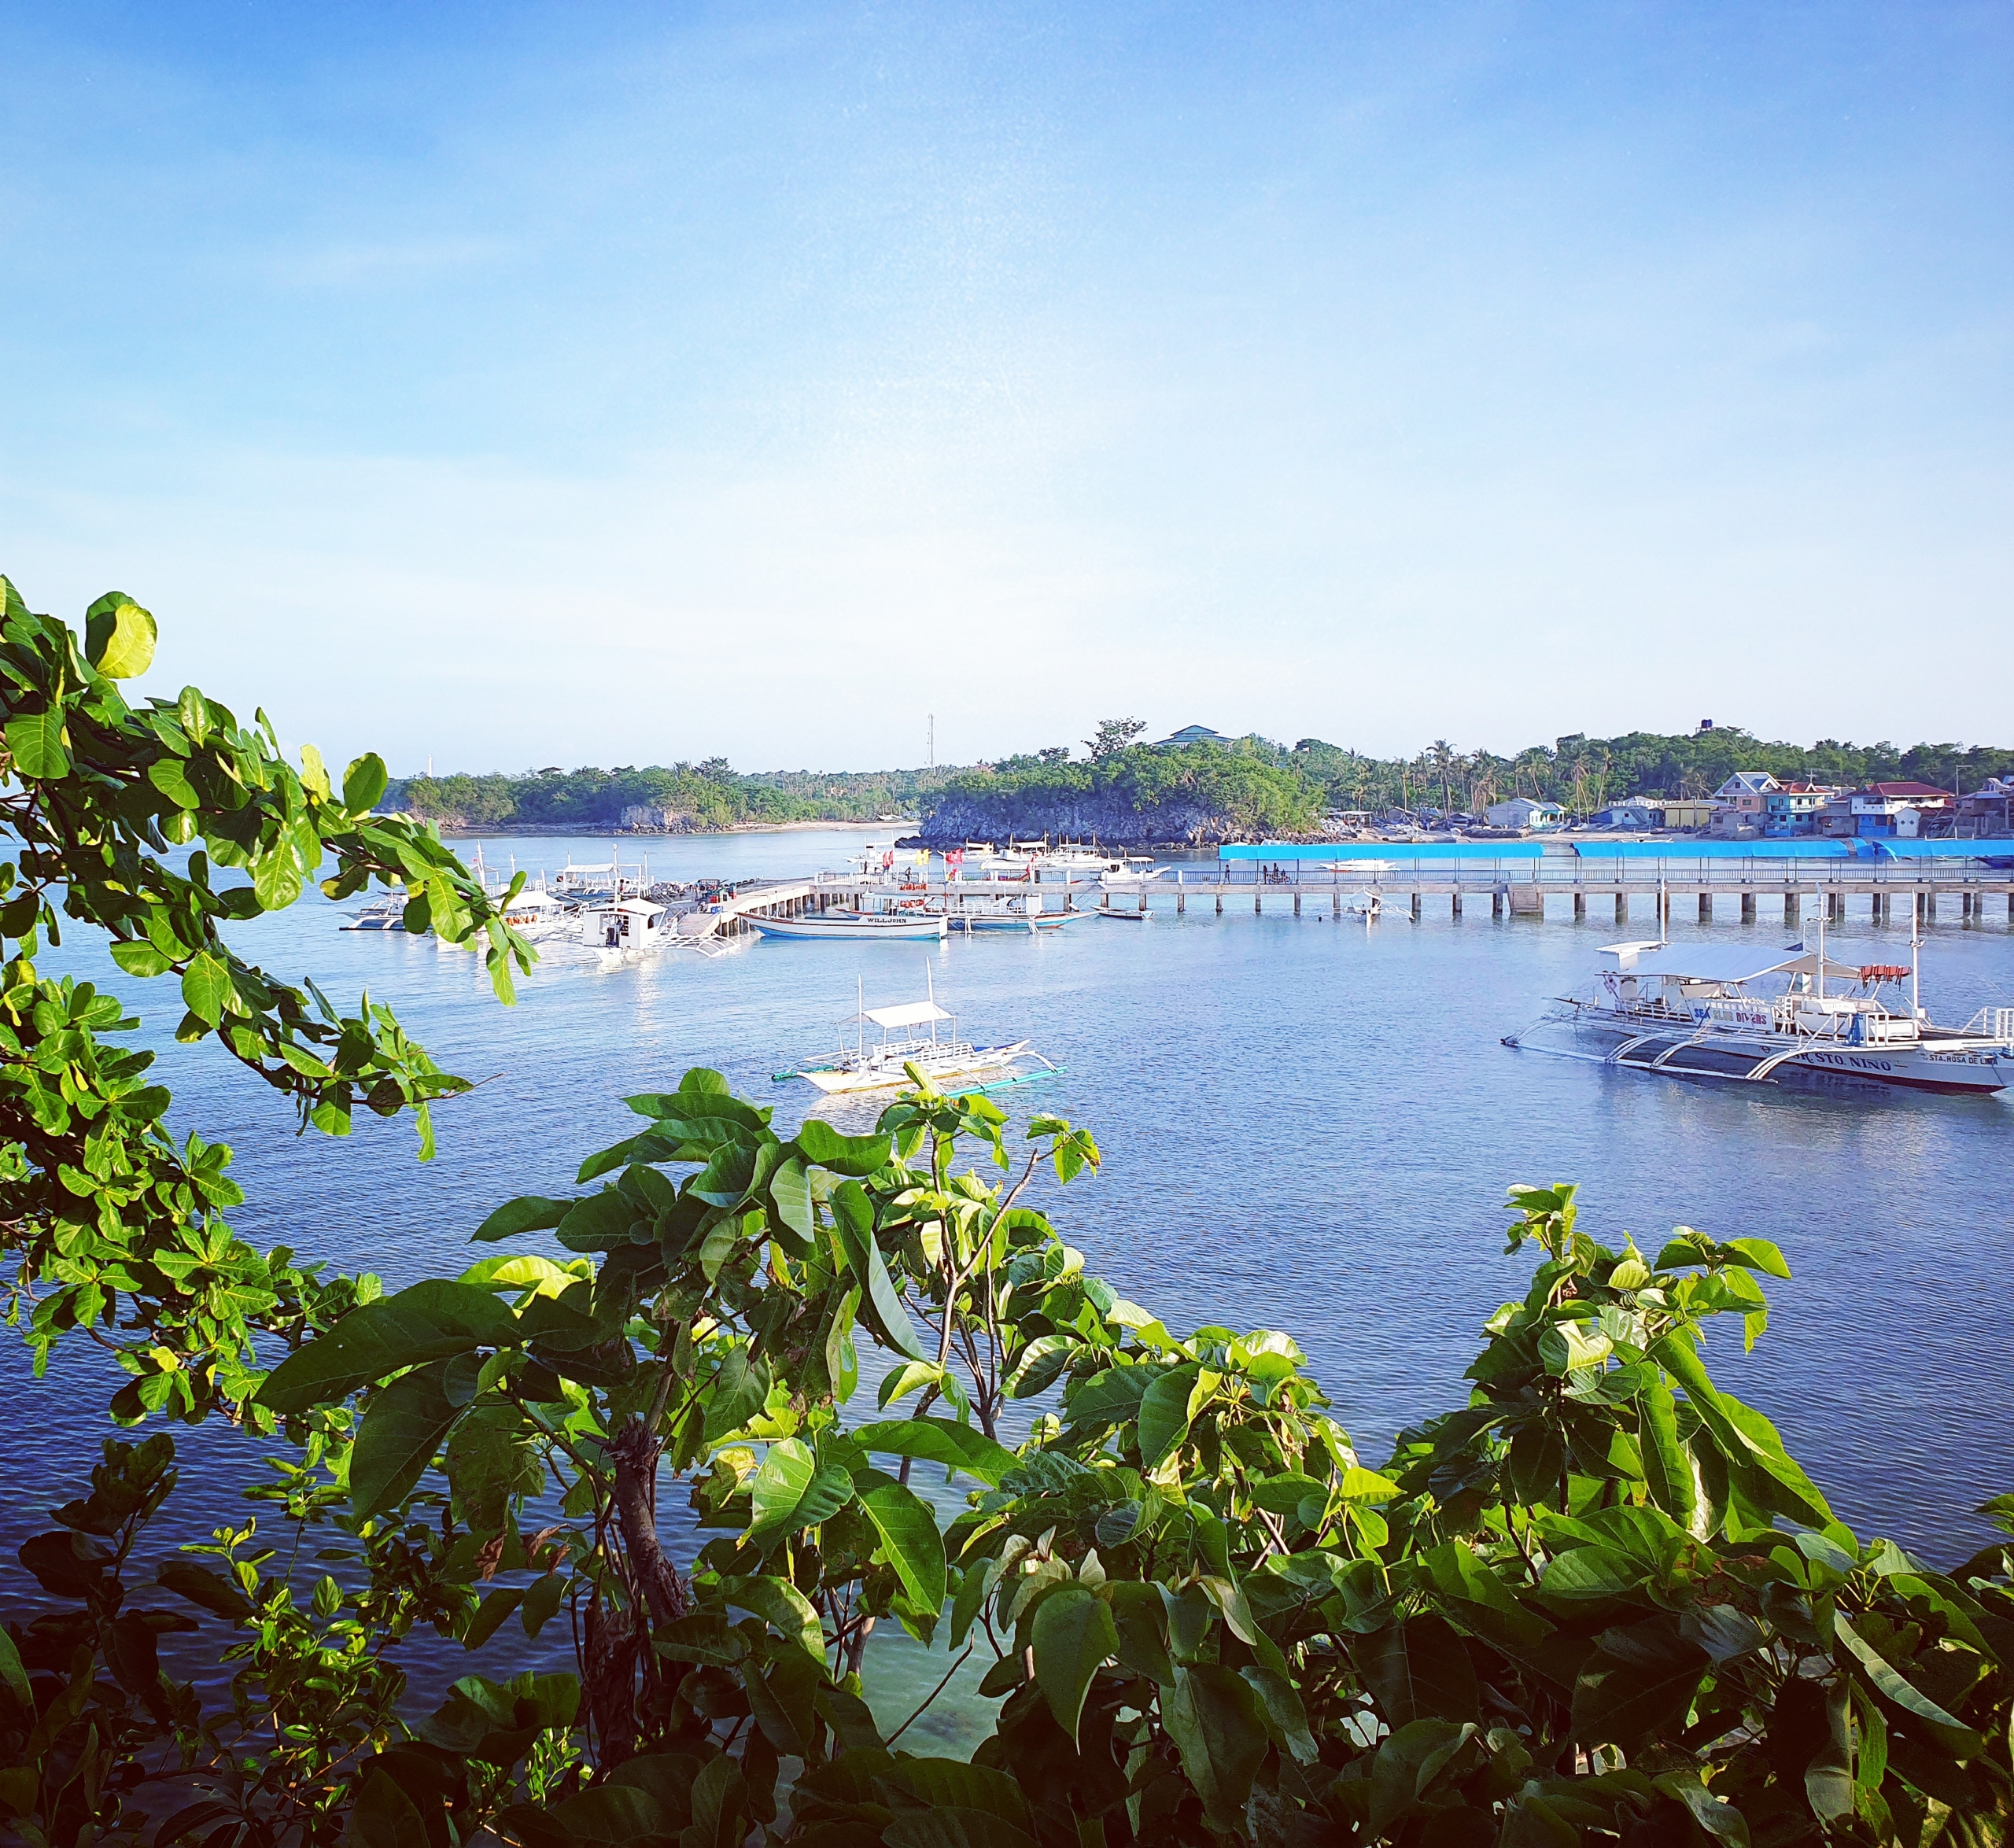 Isola di Malapasqua, Olgiata Diving Febbraio 2020, People 17